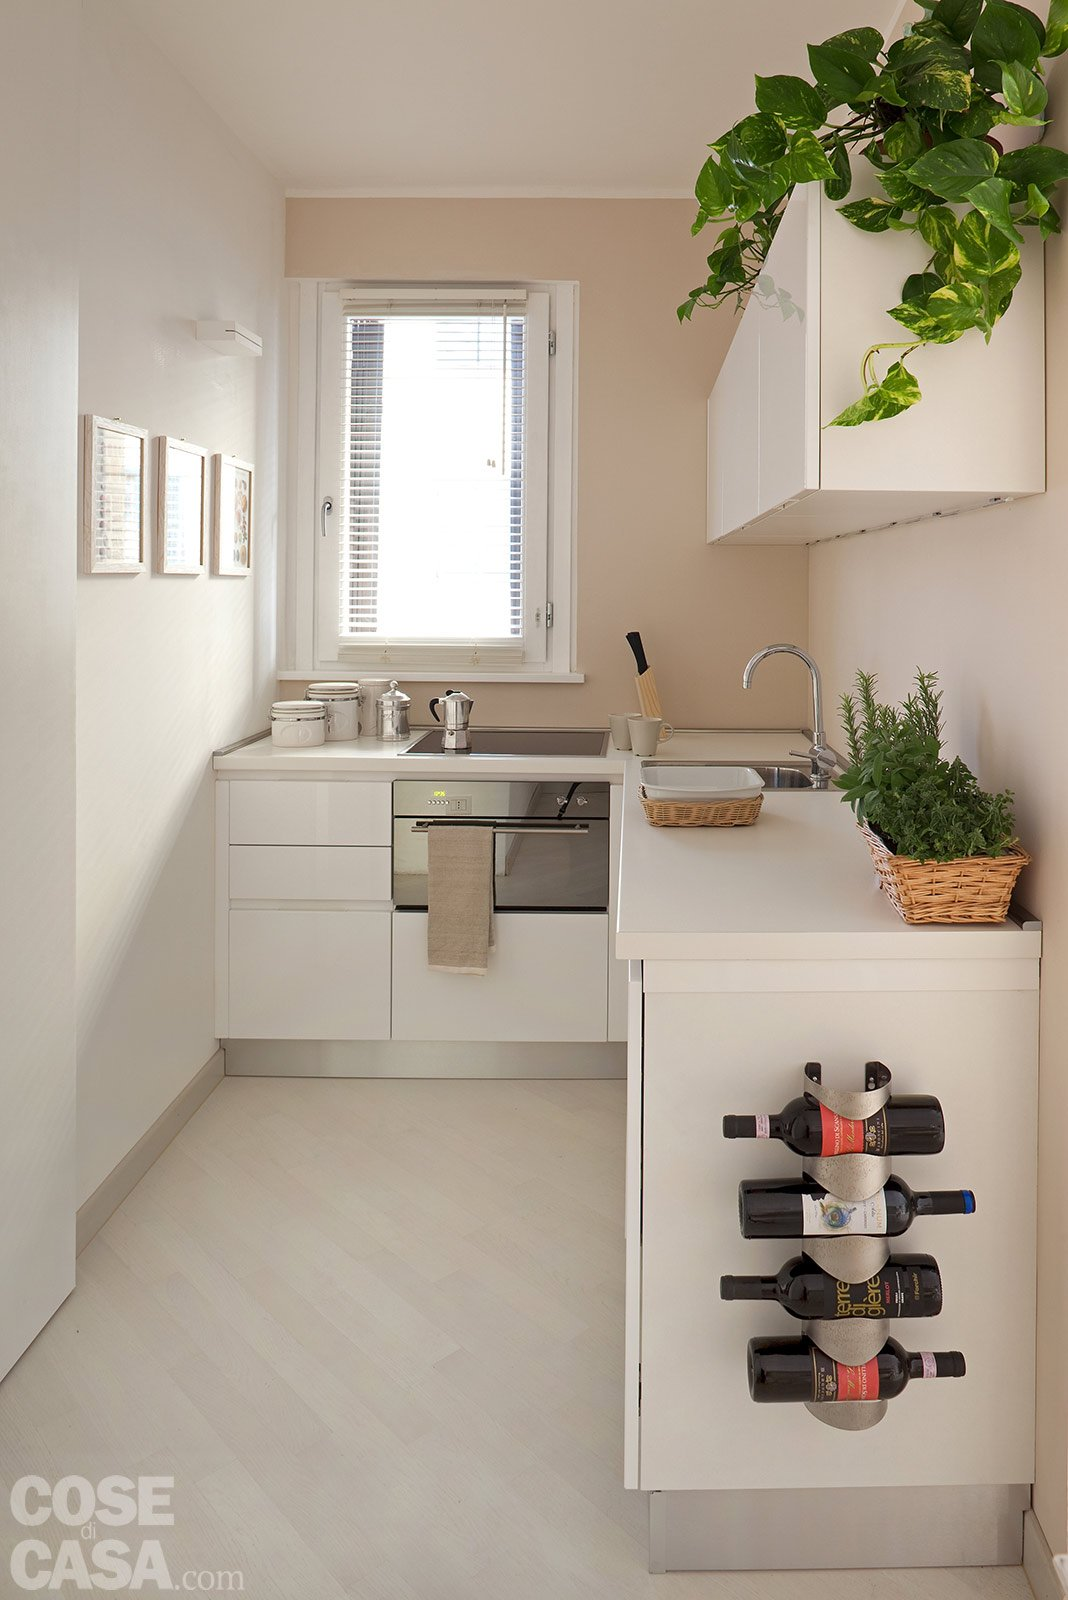 44 mq una stanza in pi in casa cose di casa - Montare una finestra ...